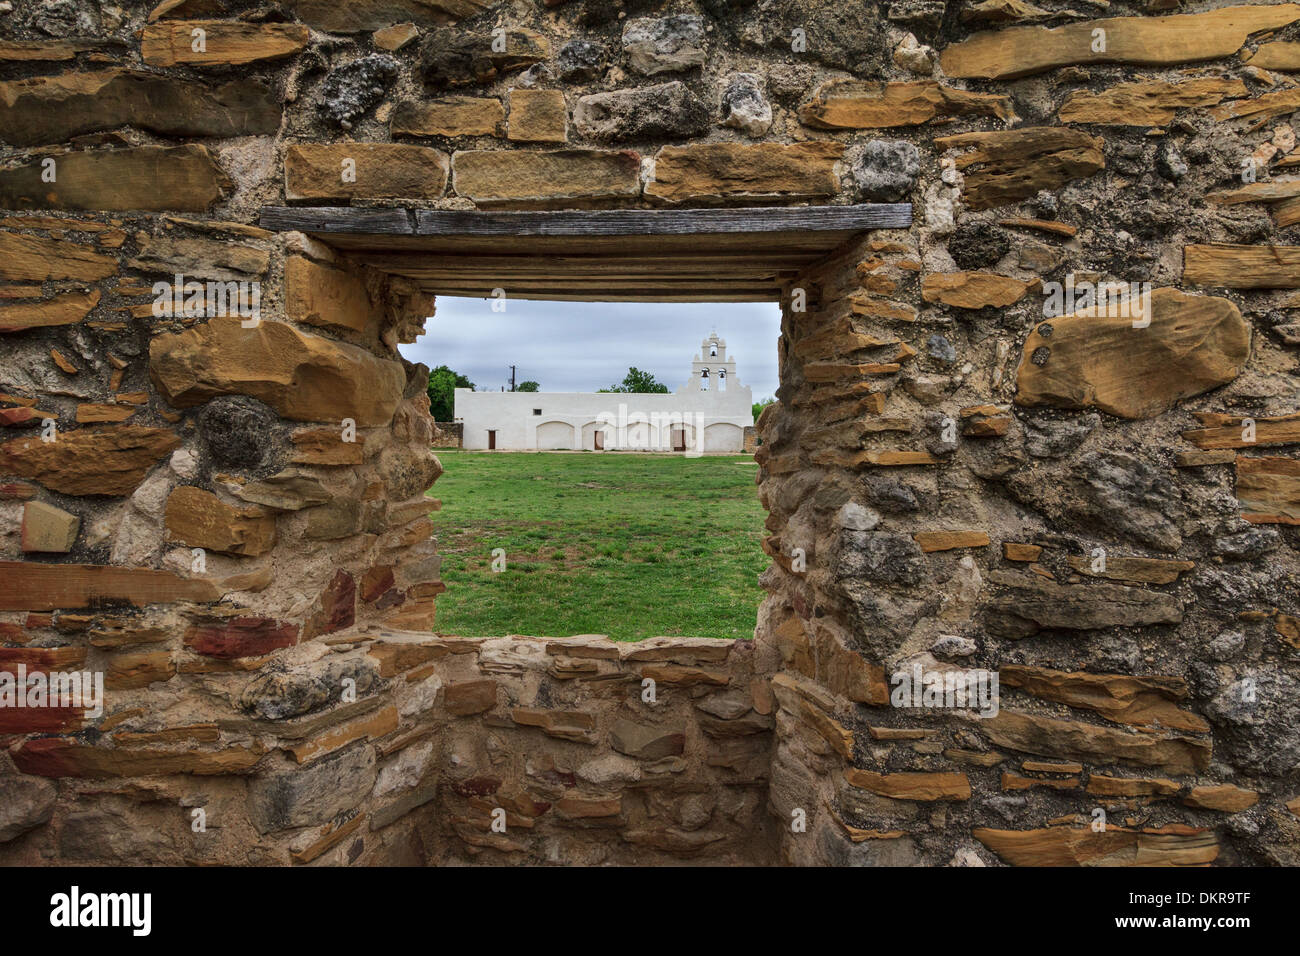 San antonio san juan capistrano mission stone wall texas usa